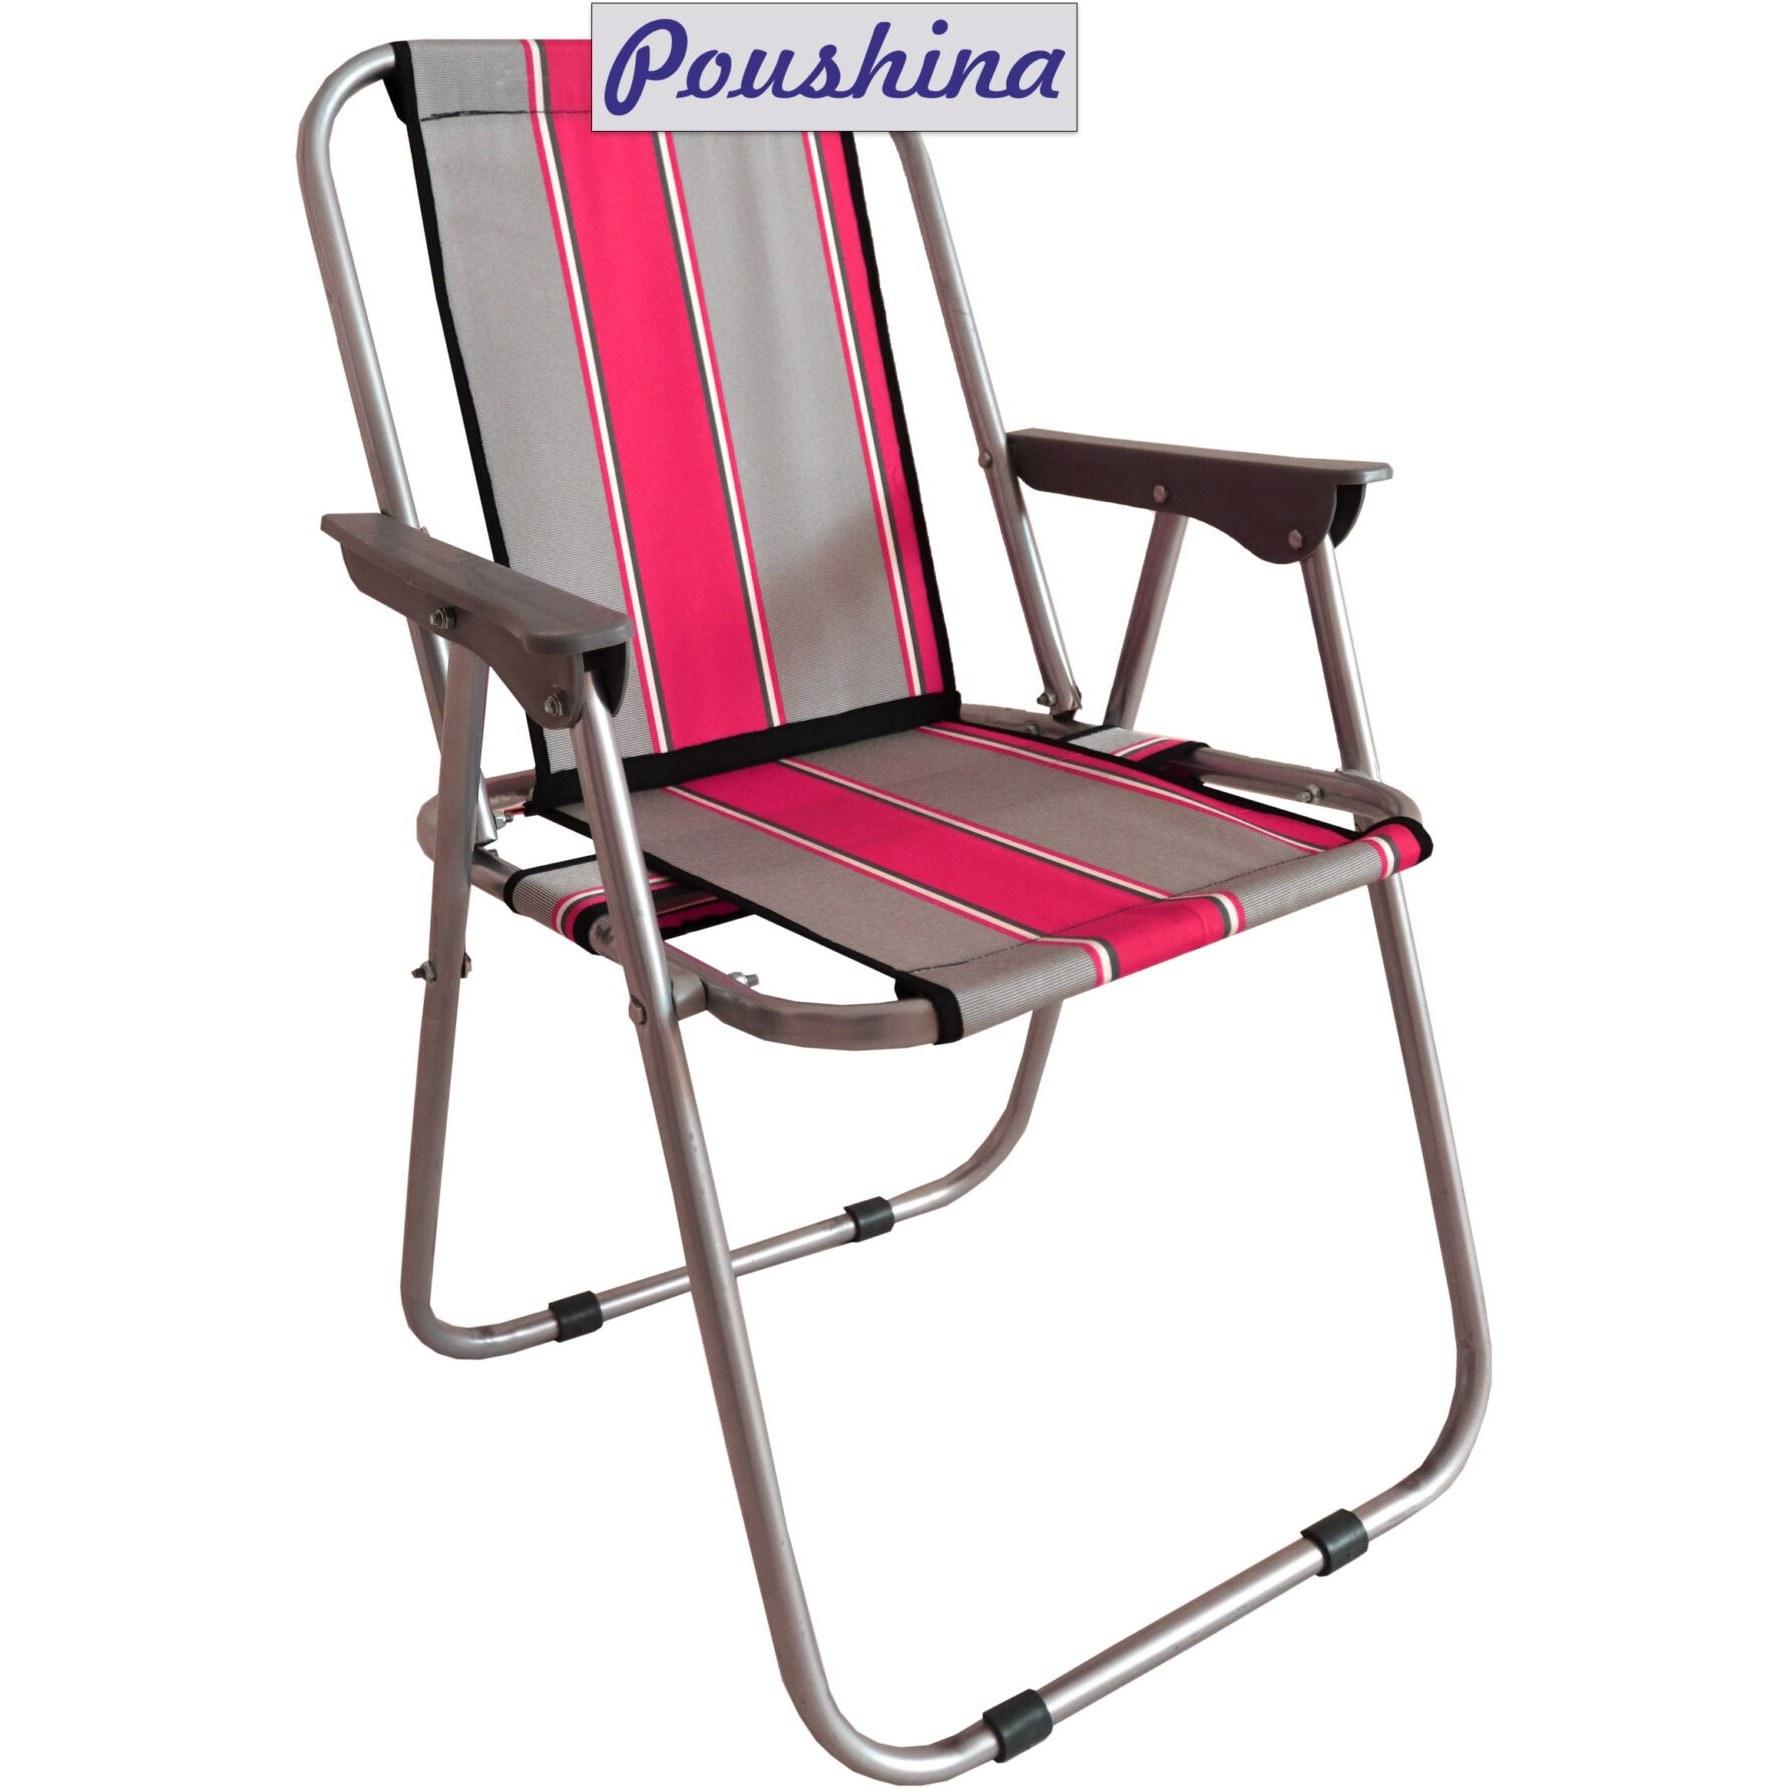 تصویر صندلی مسافرتی تاشو پوشینا کد 511